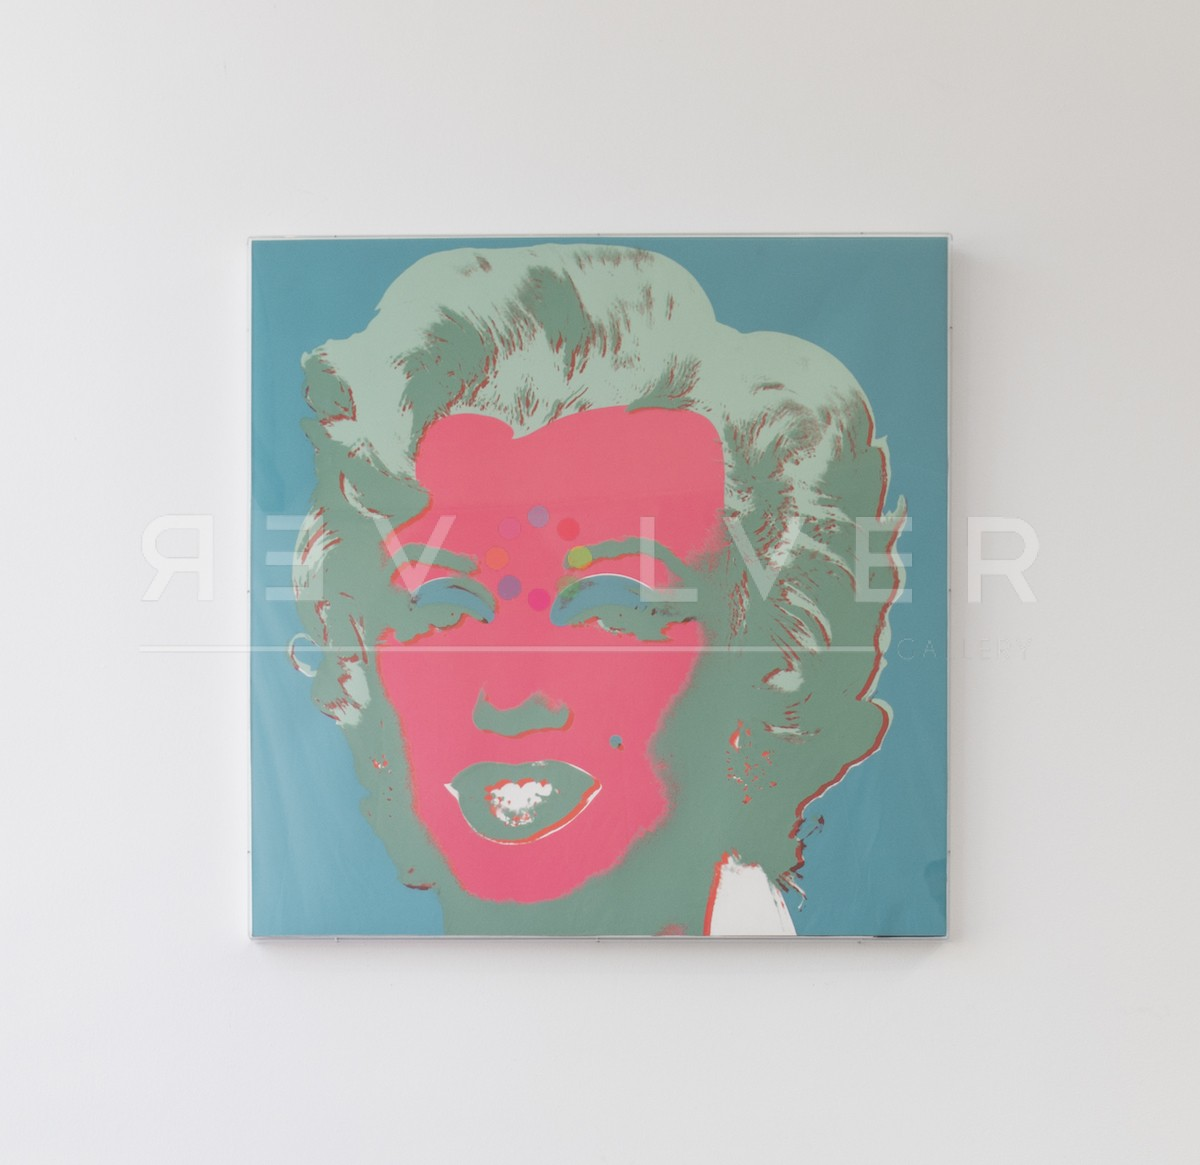 Andy Warhol - Marilyn Monroe 30